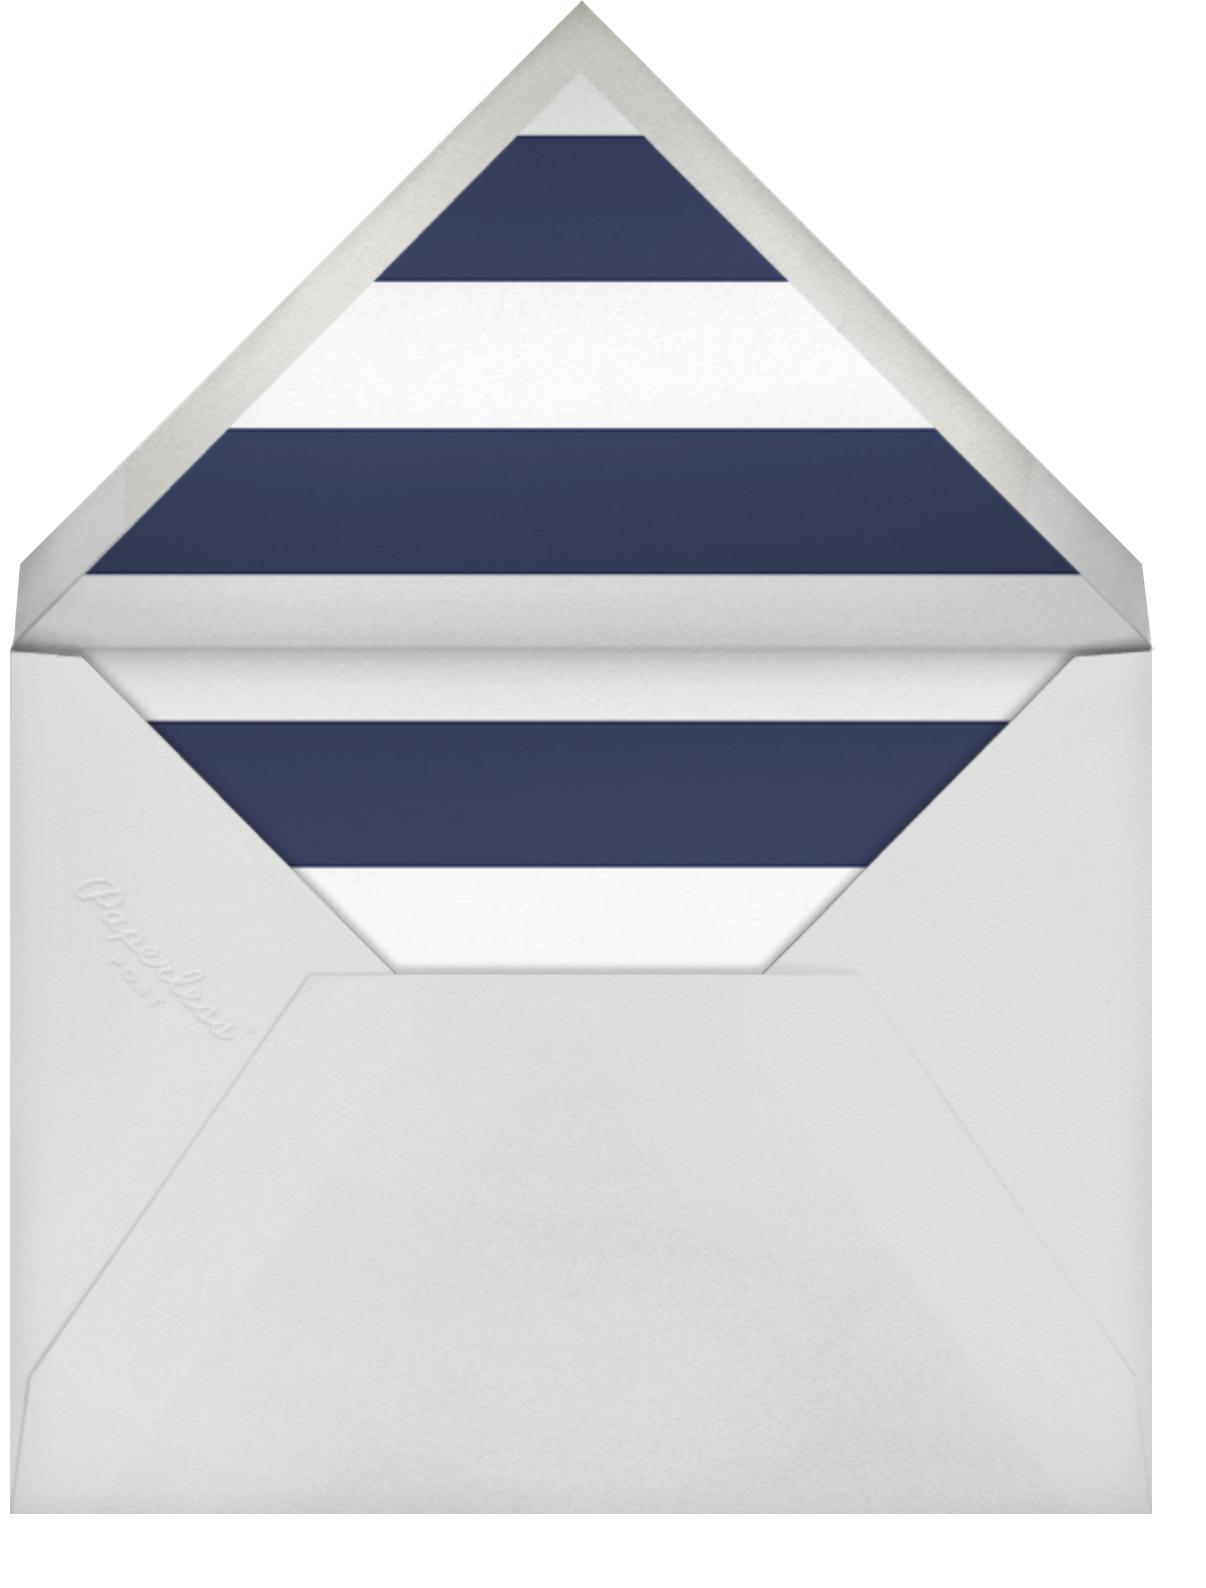 Stripe Suite (Stationery) - Navy - kate spade new york - Envelope